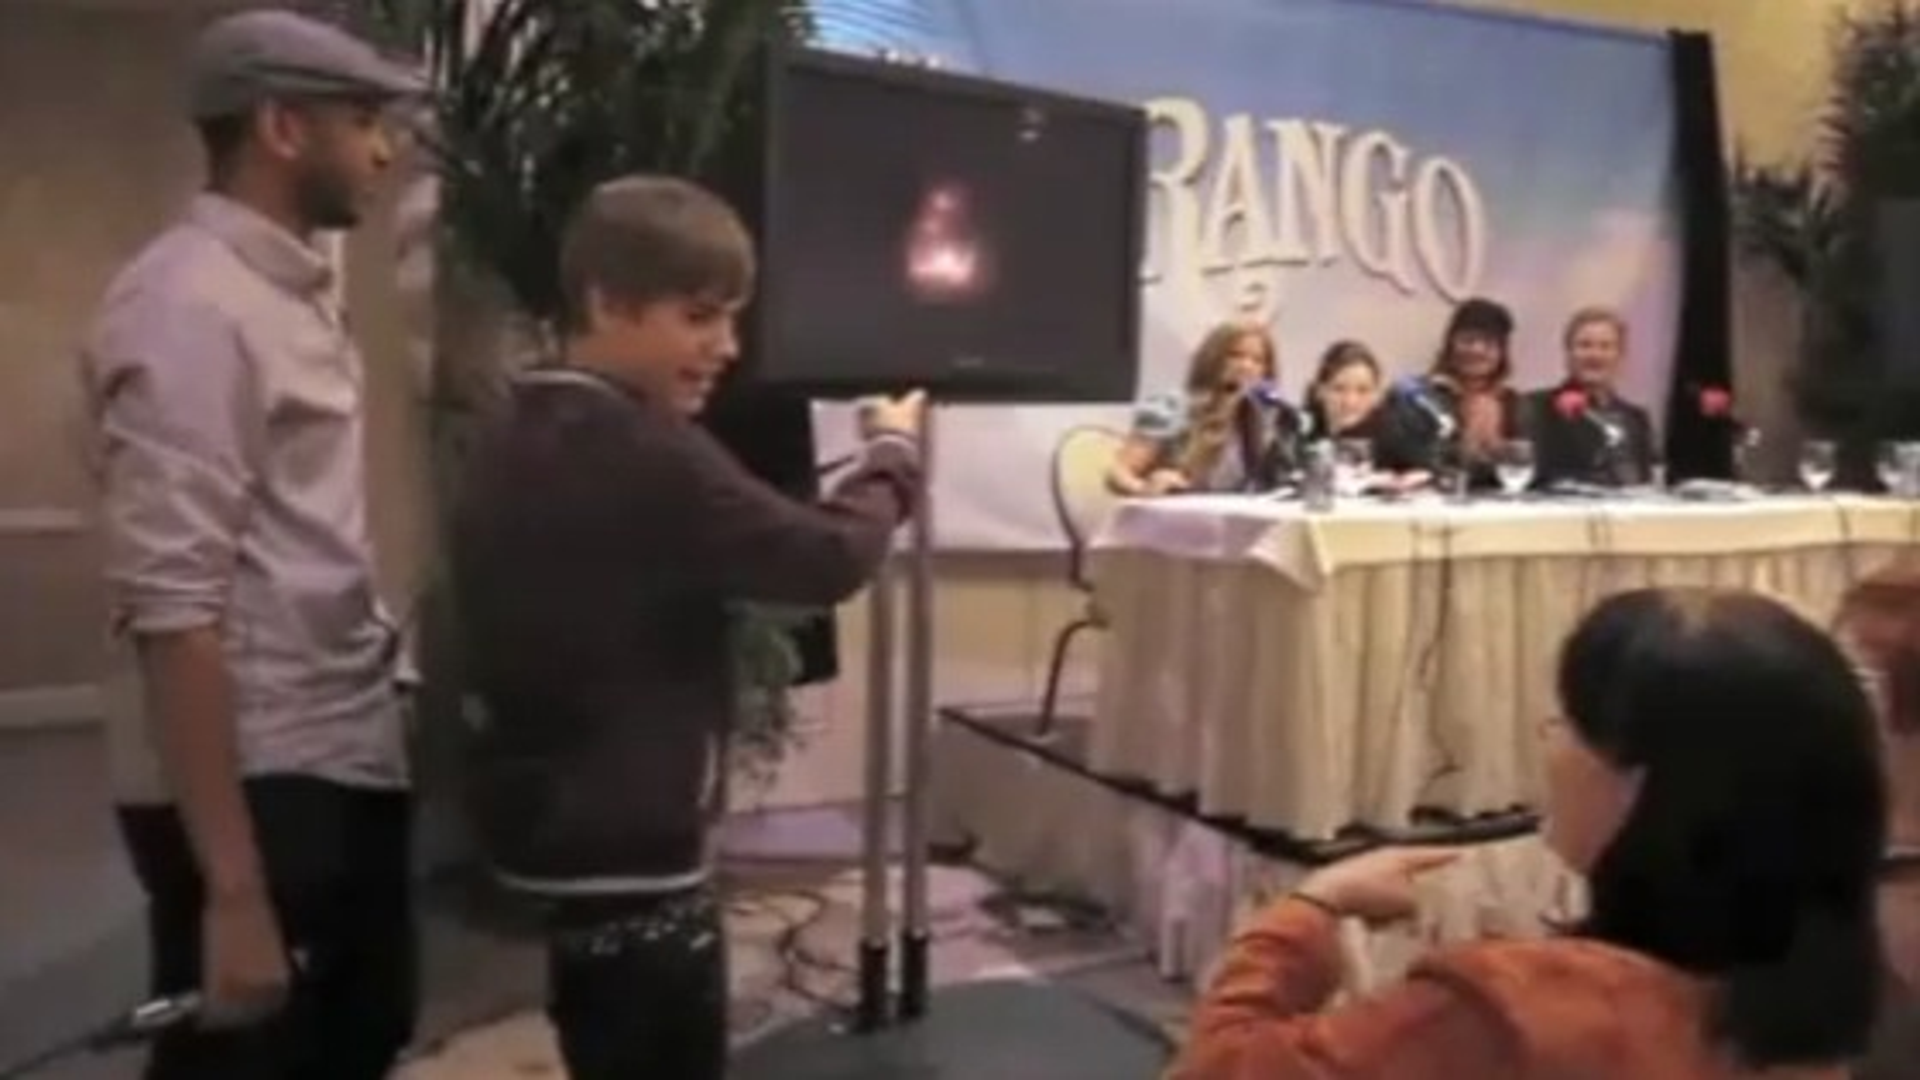 Justin Bieber Johnny Depp Rango